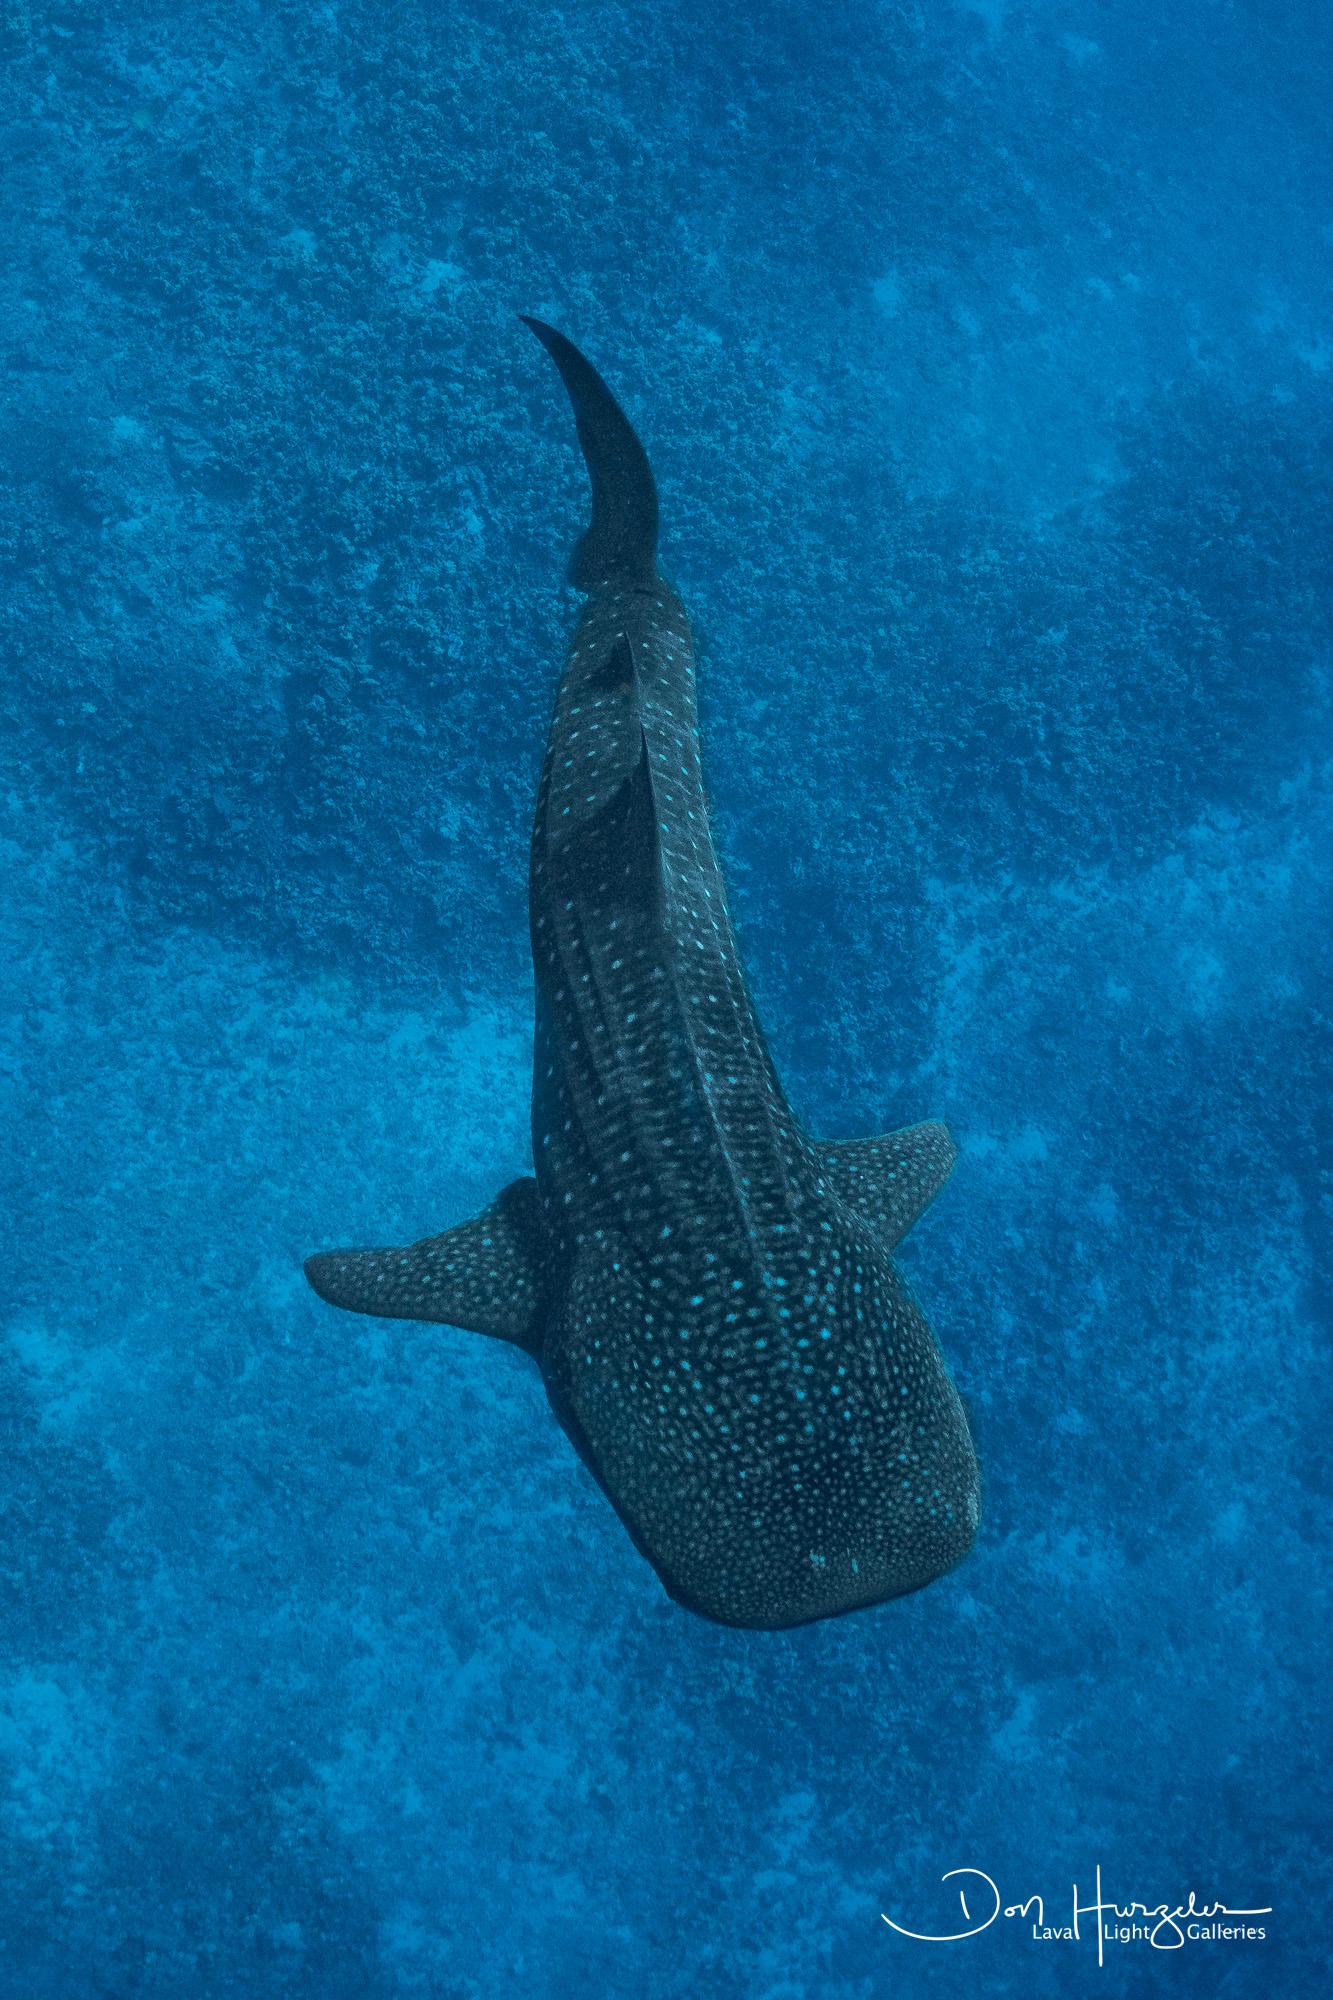 Whale Shark Vertical